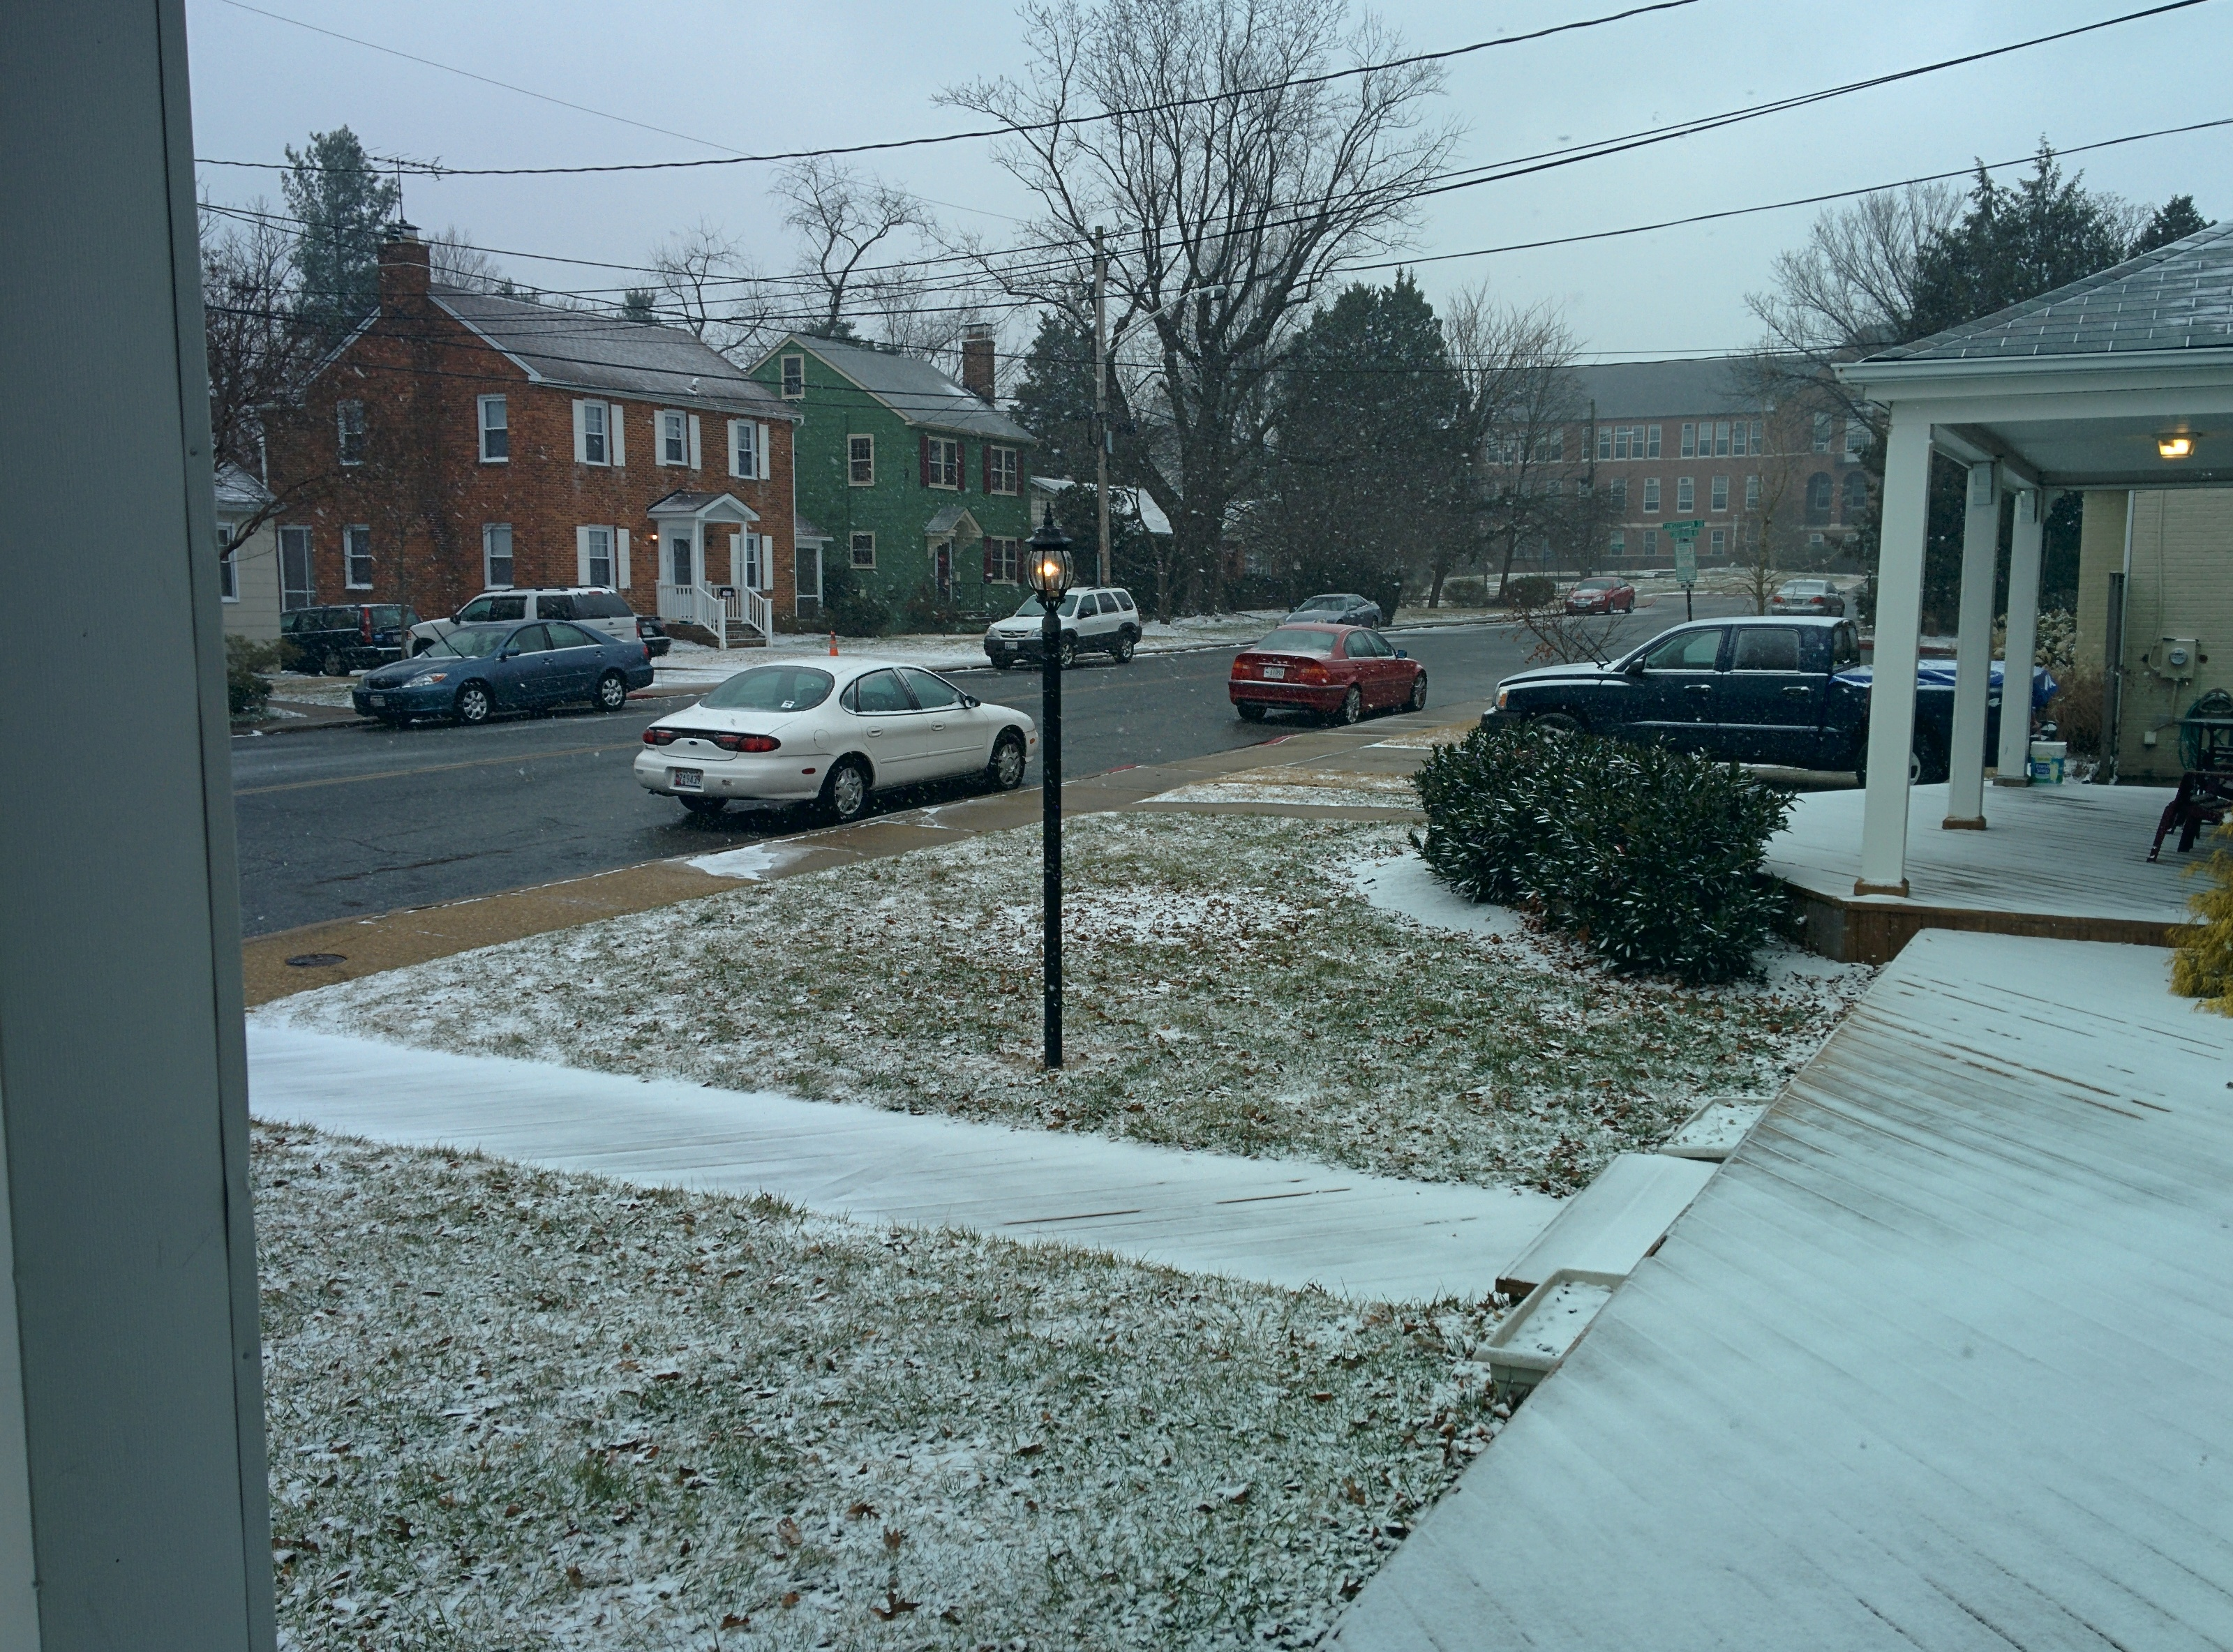 Start of the snow